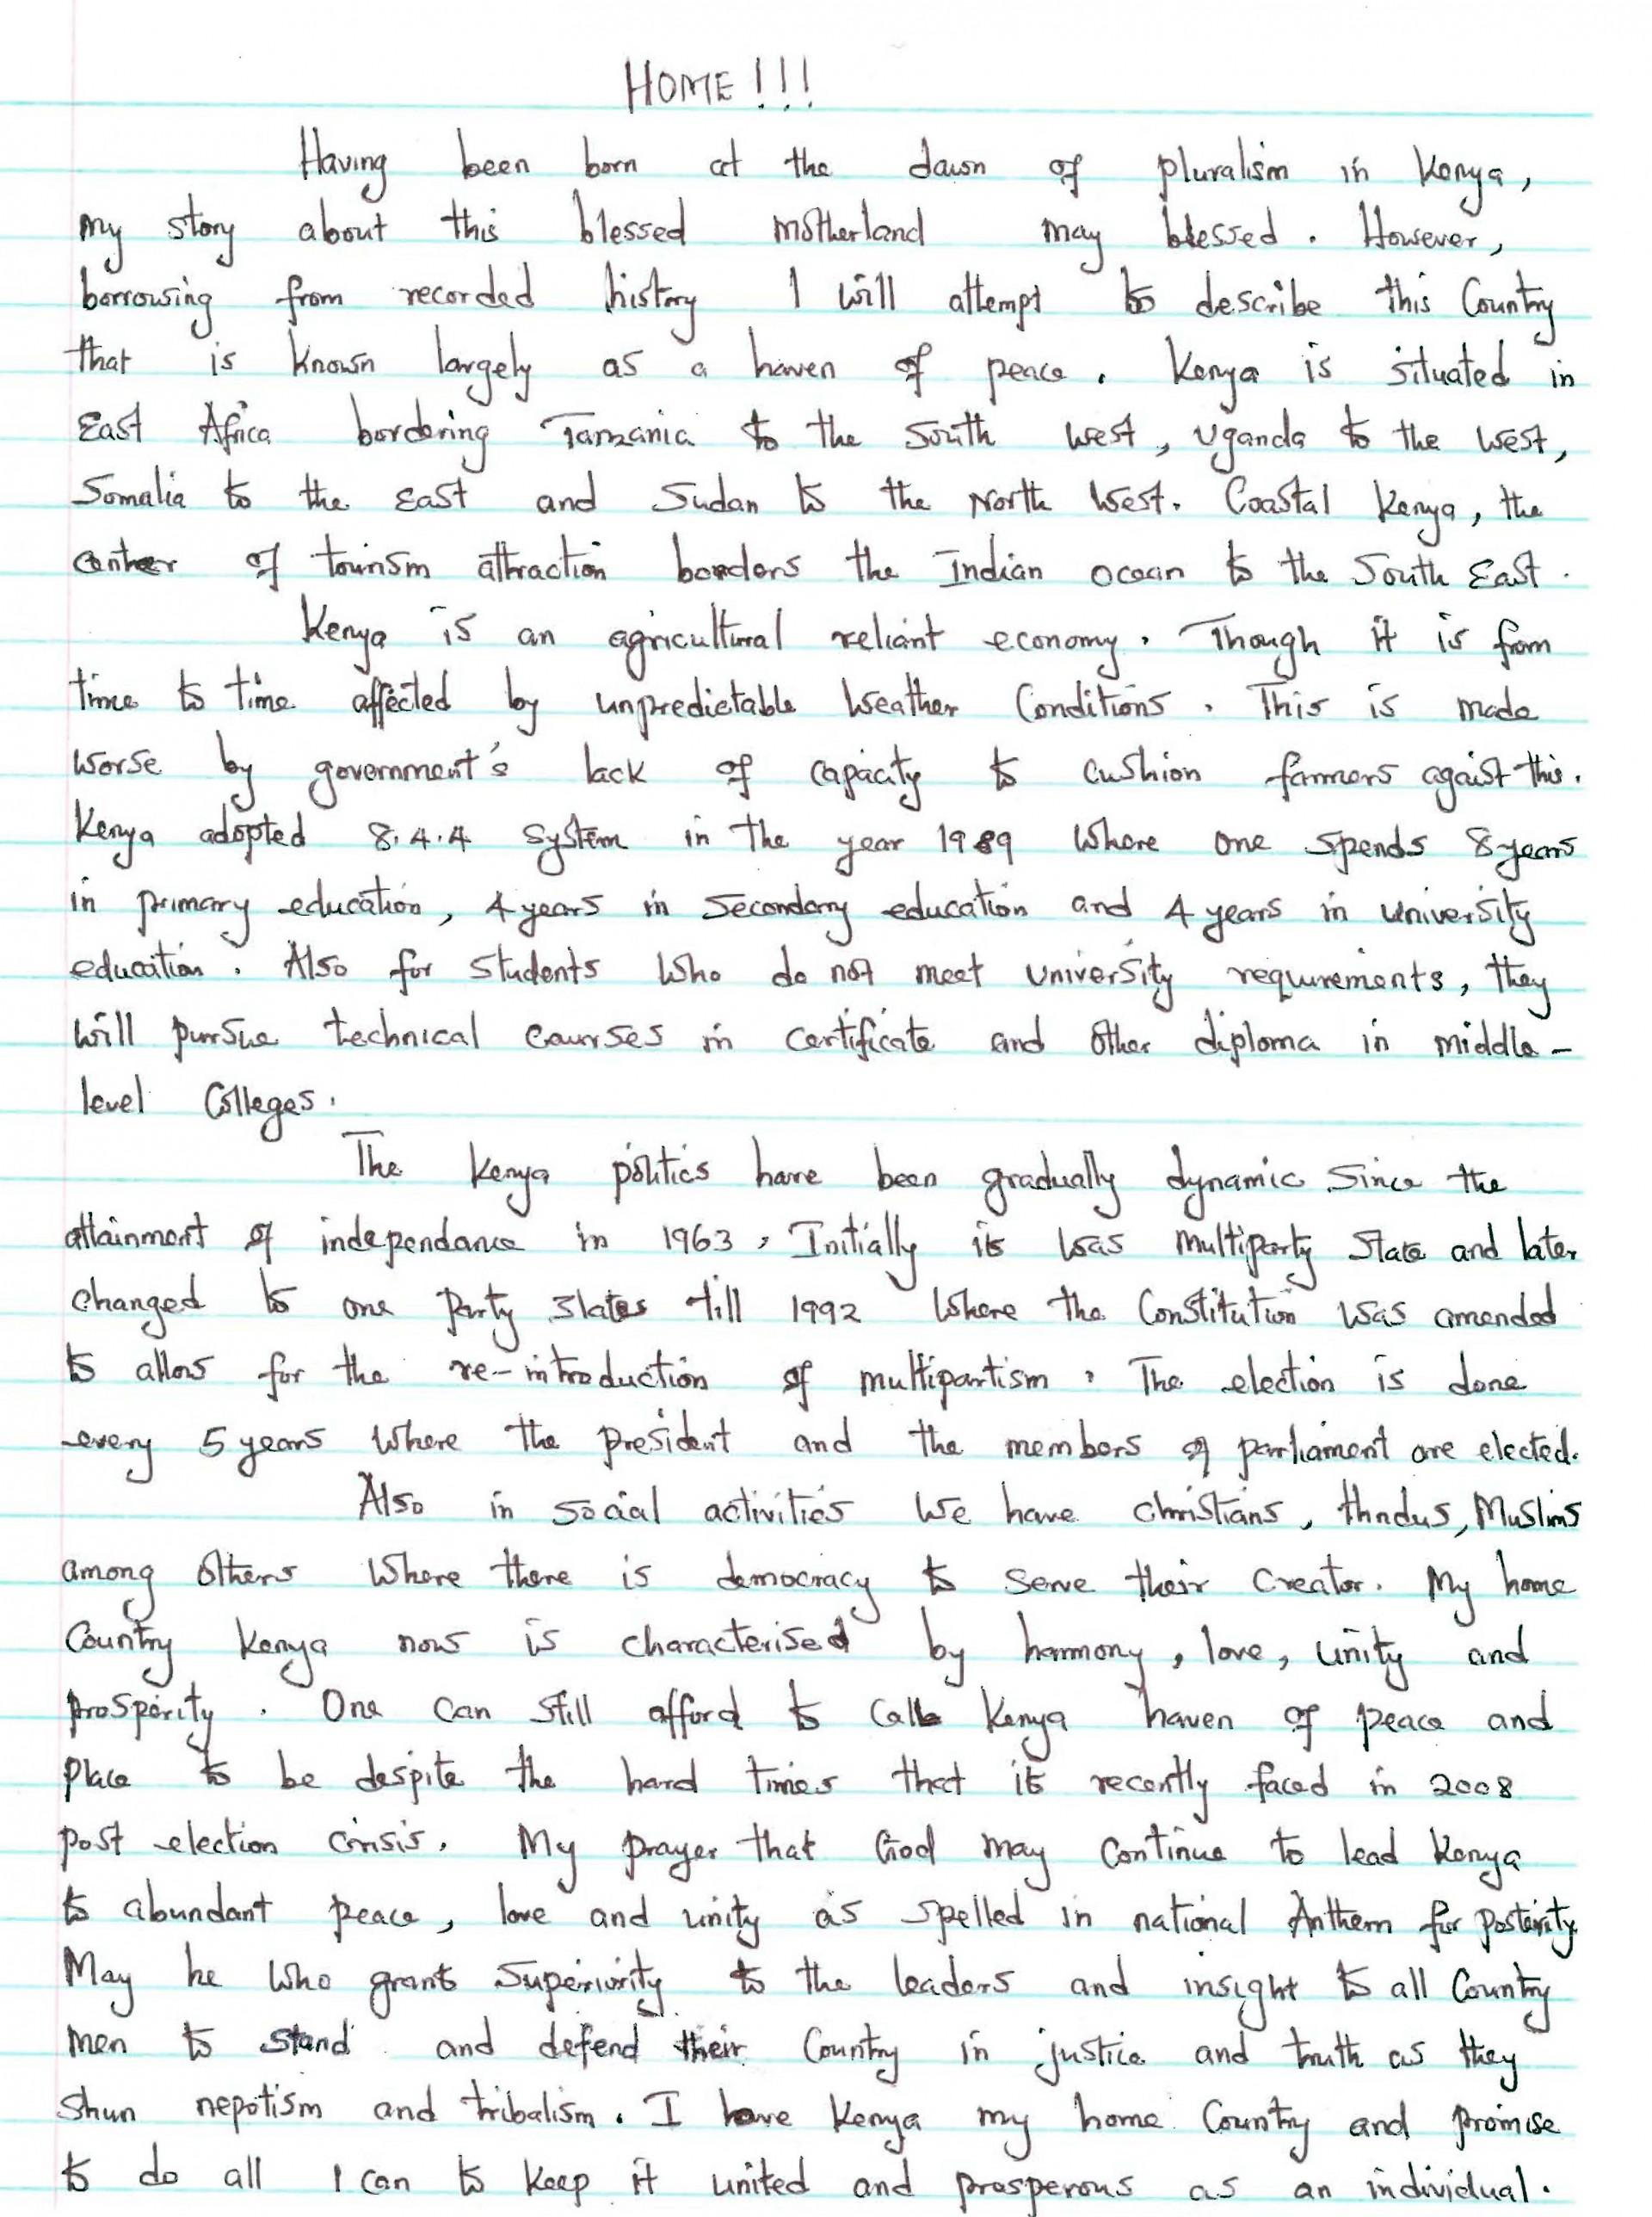 005 My Dream House Descriptive Essay Description Sweet Home Wr Writing Beautiful Describing Ideal 1920